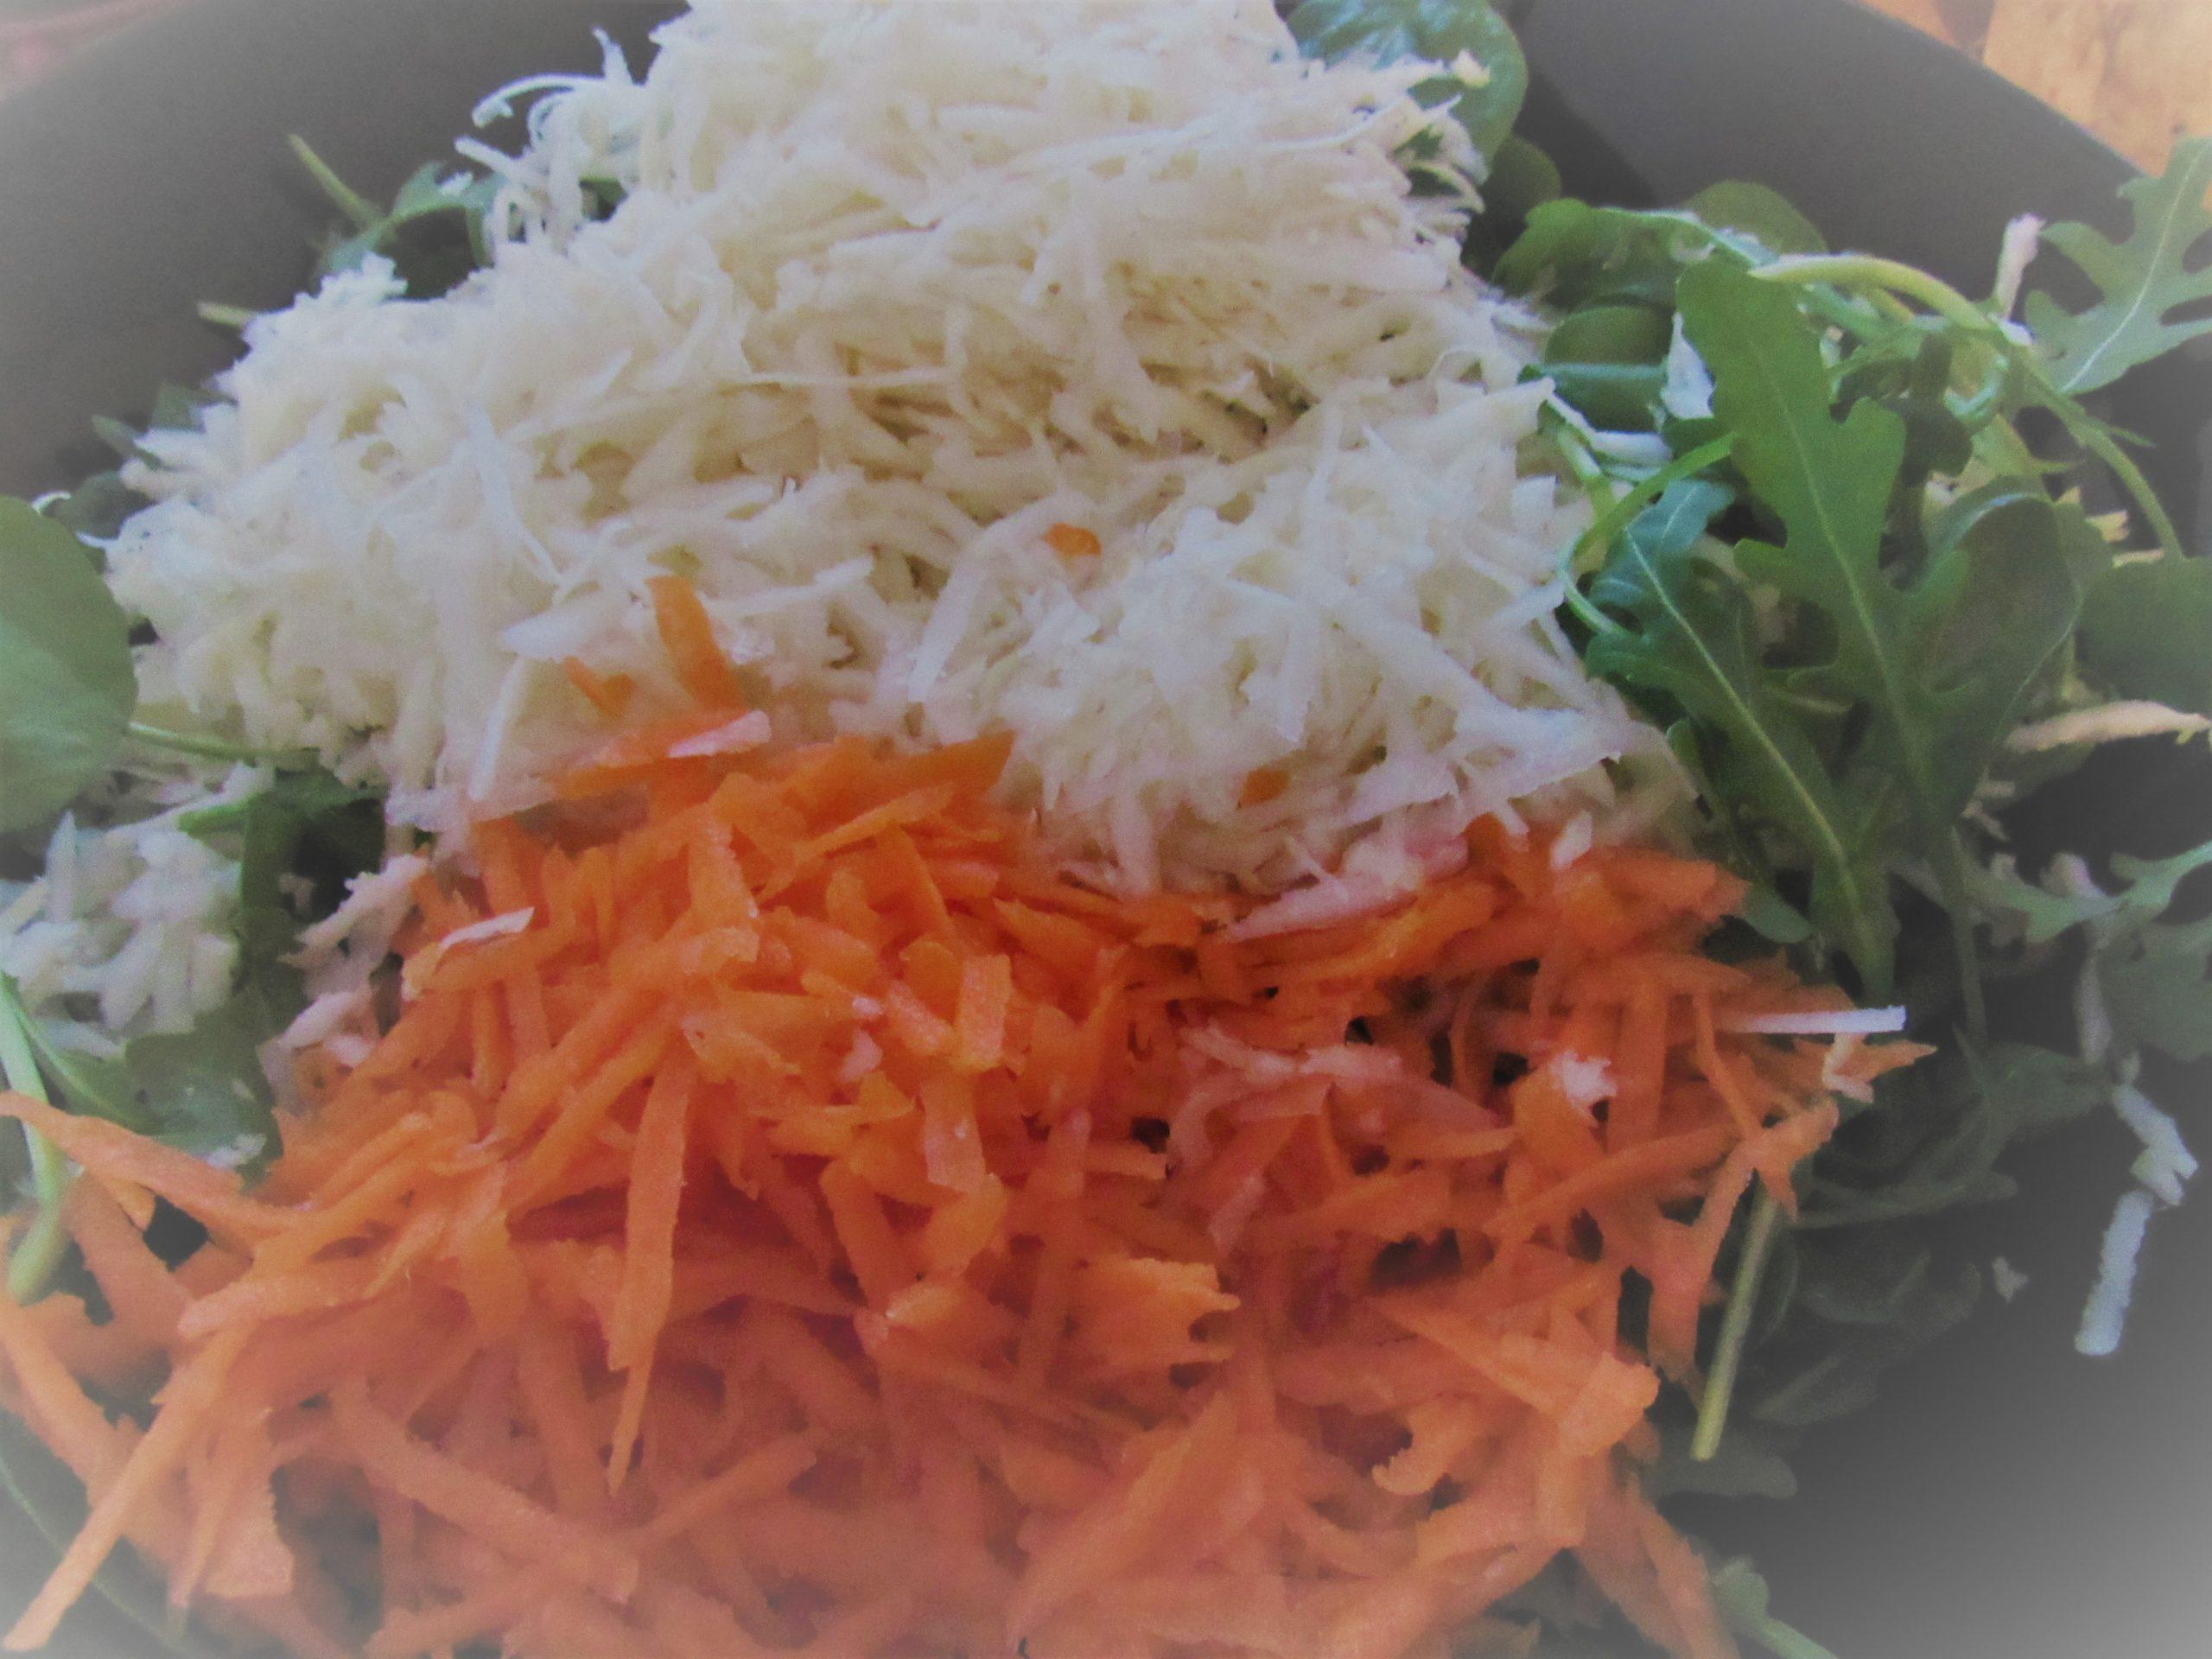 Stilton salad with celeriac and almond